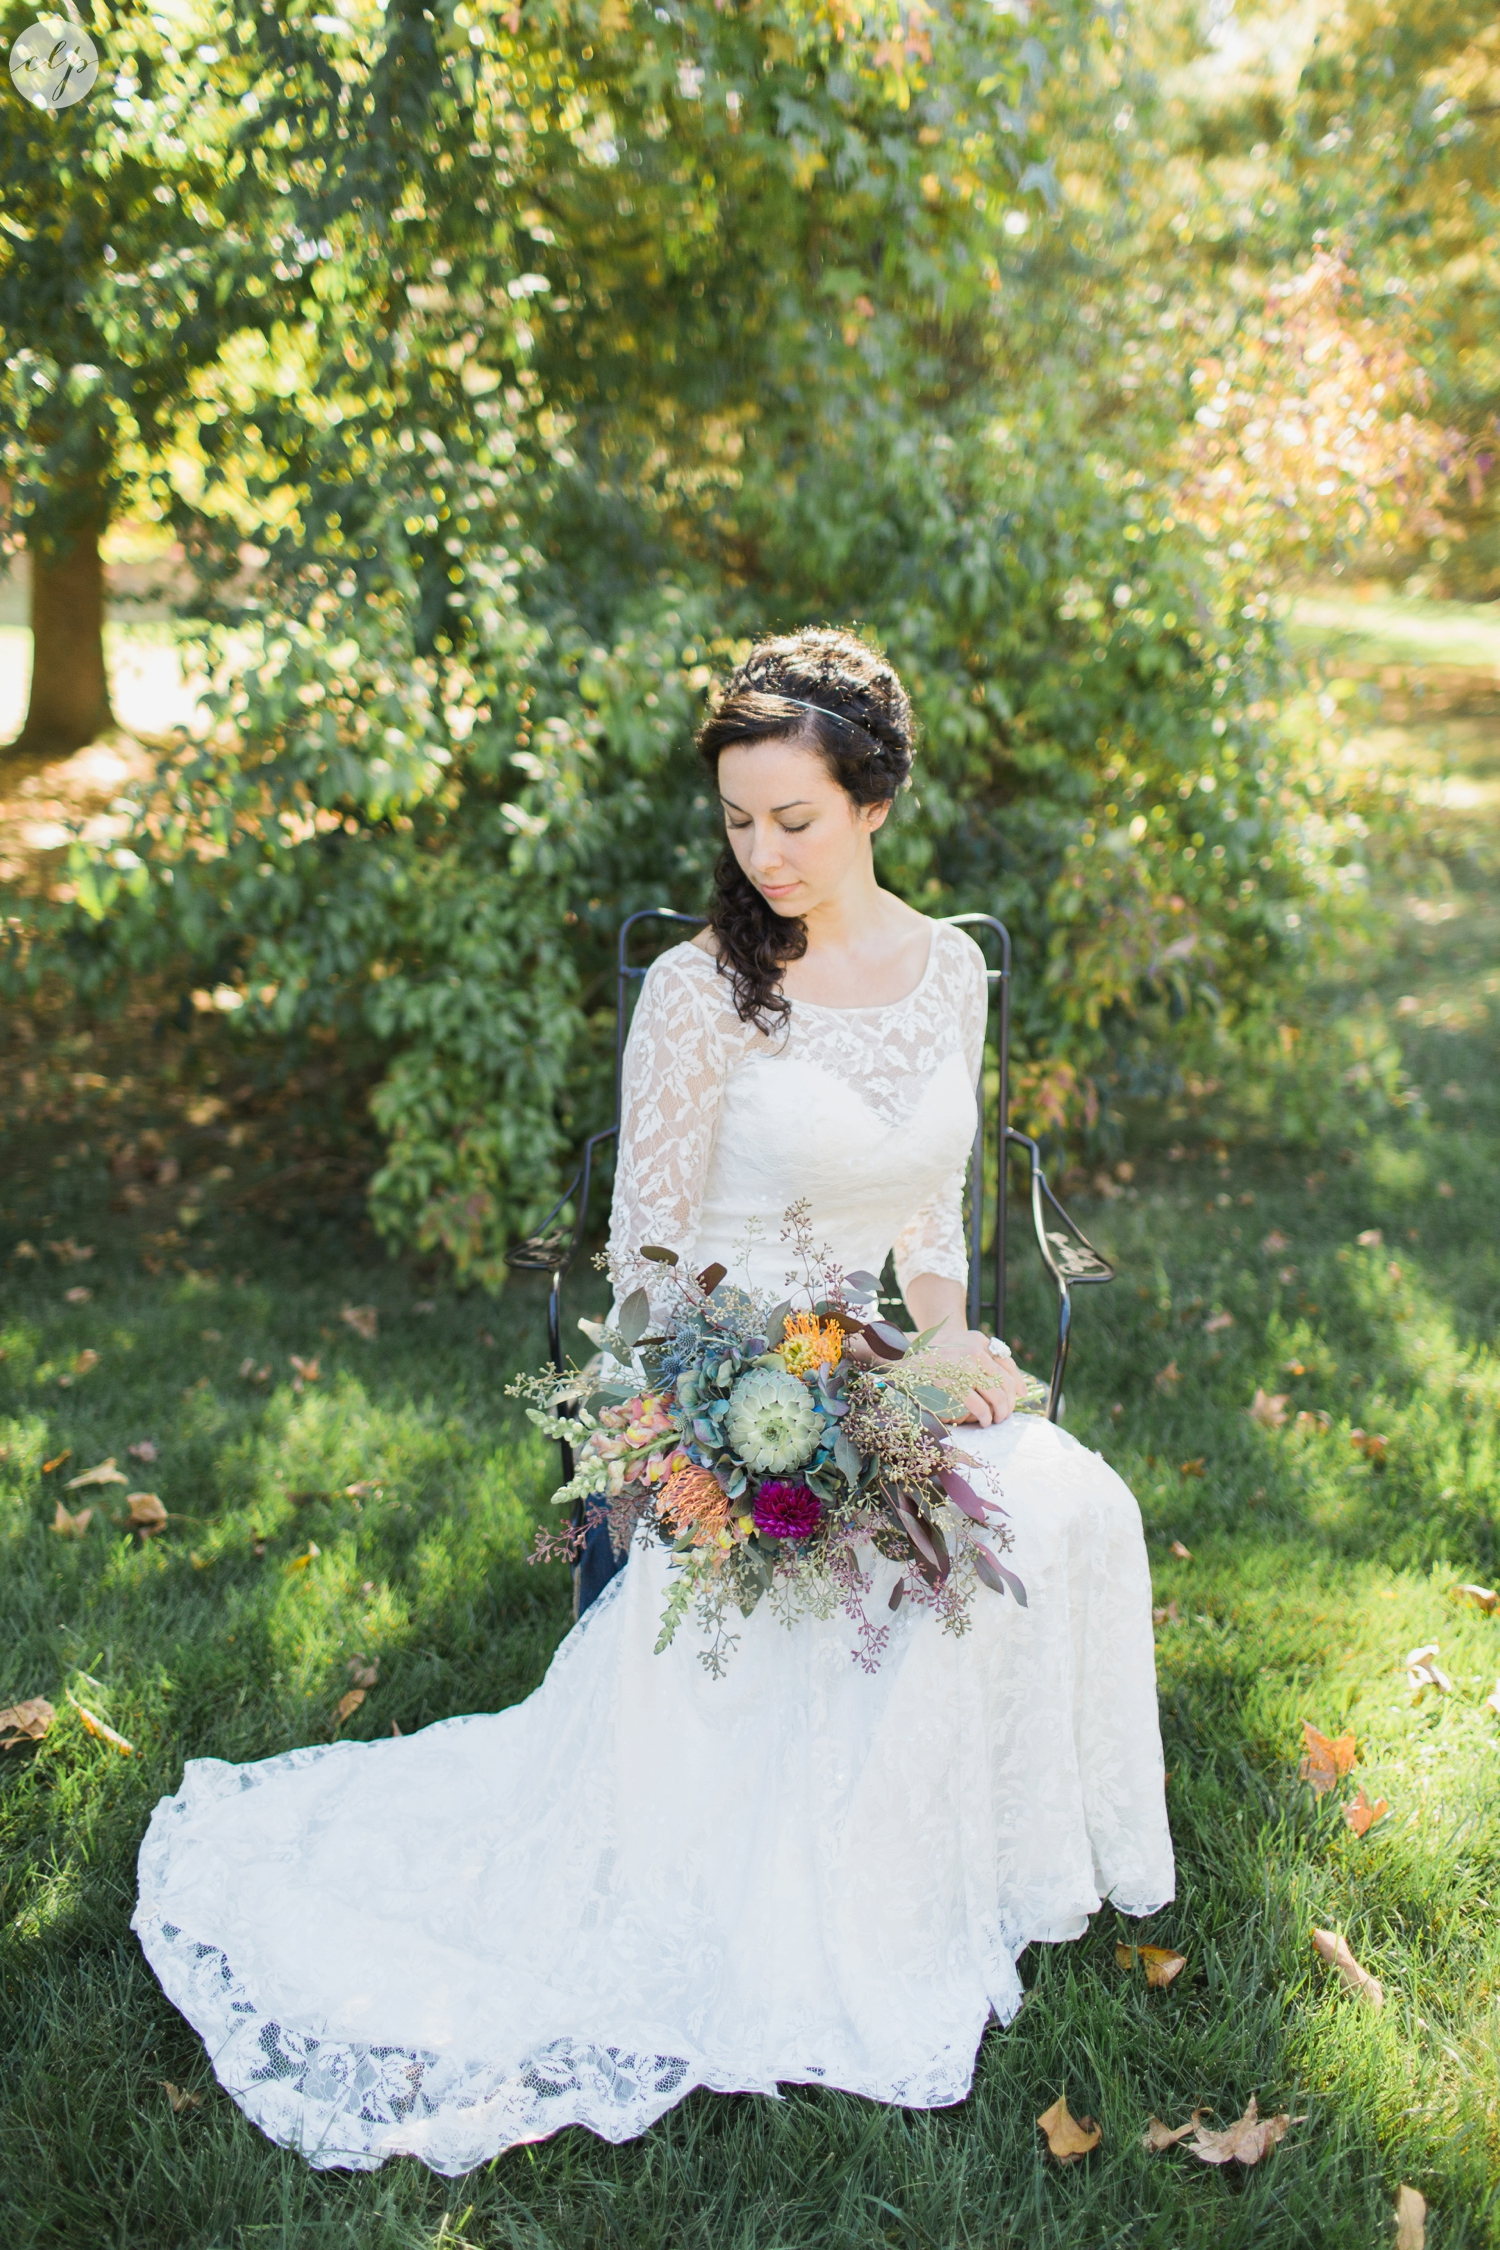 Outdoor-Wedding-in-the-Woods-Photography_4174.jpg